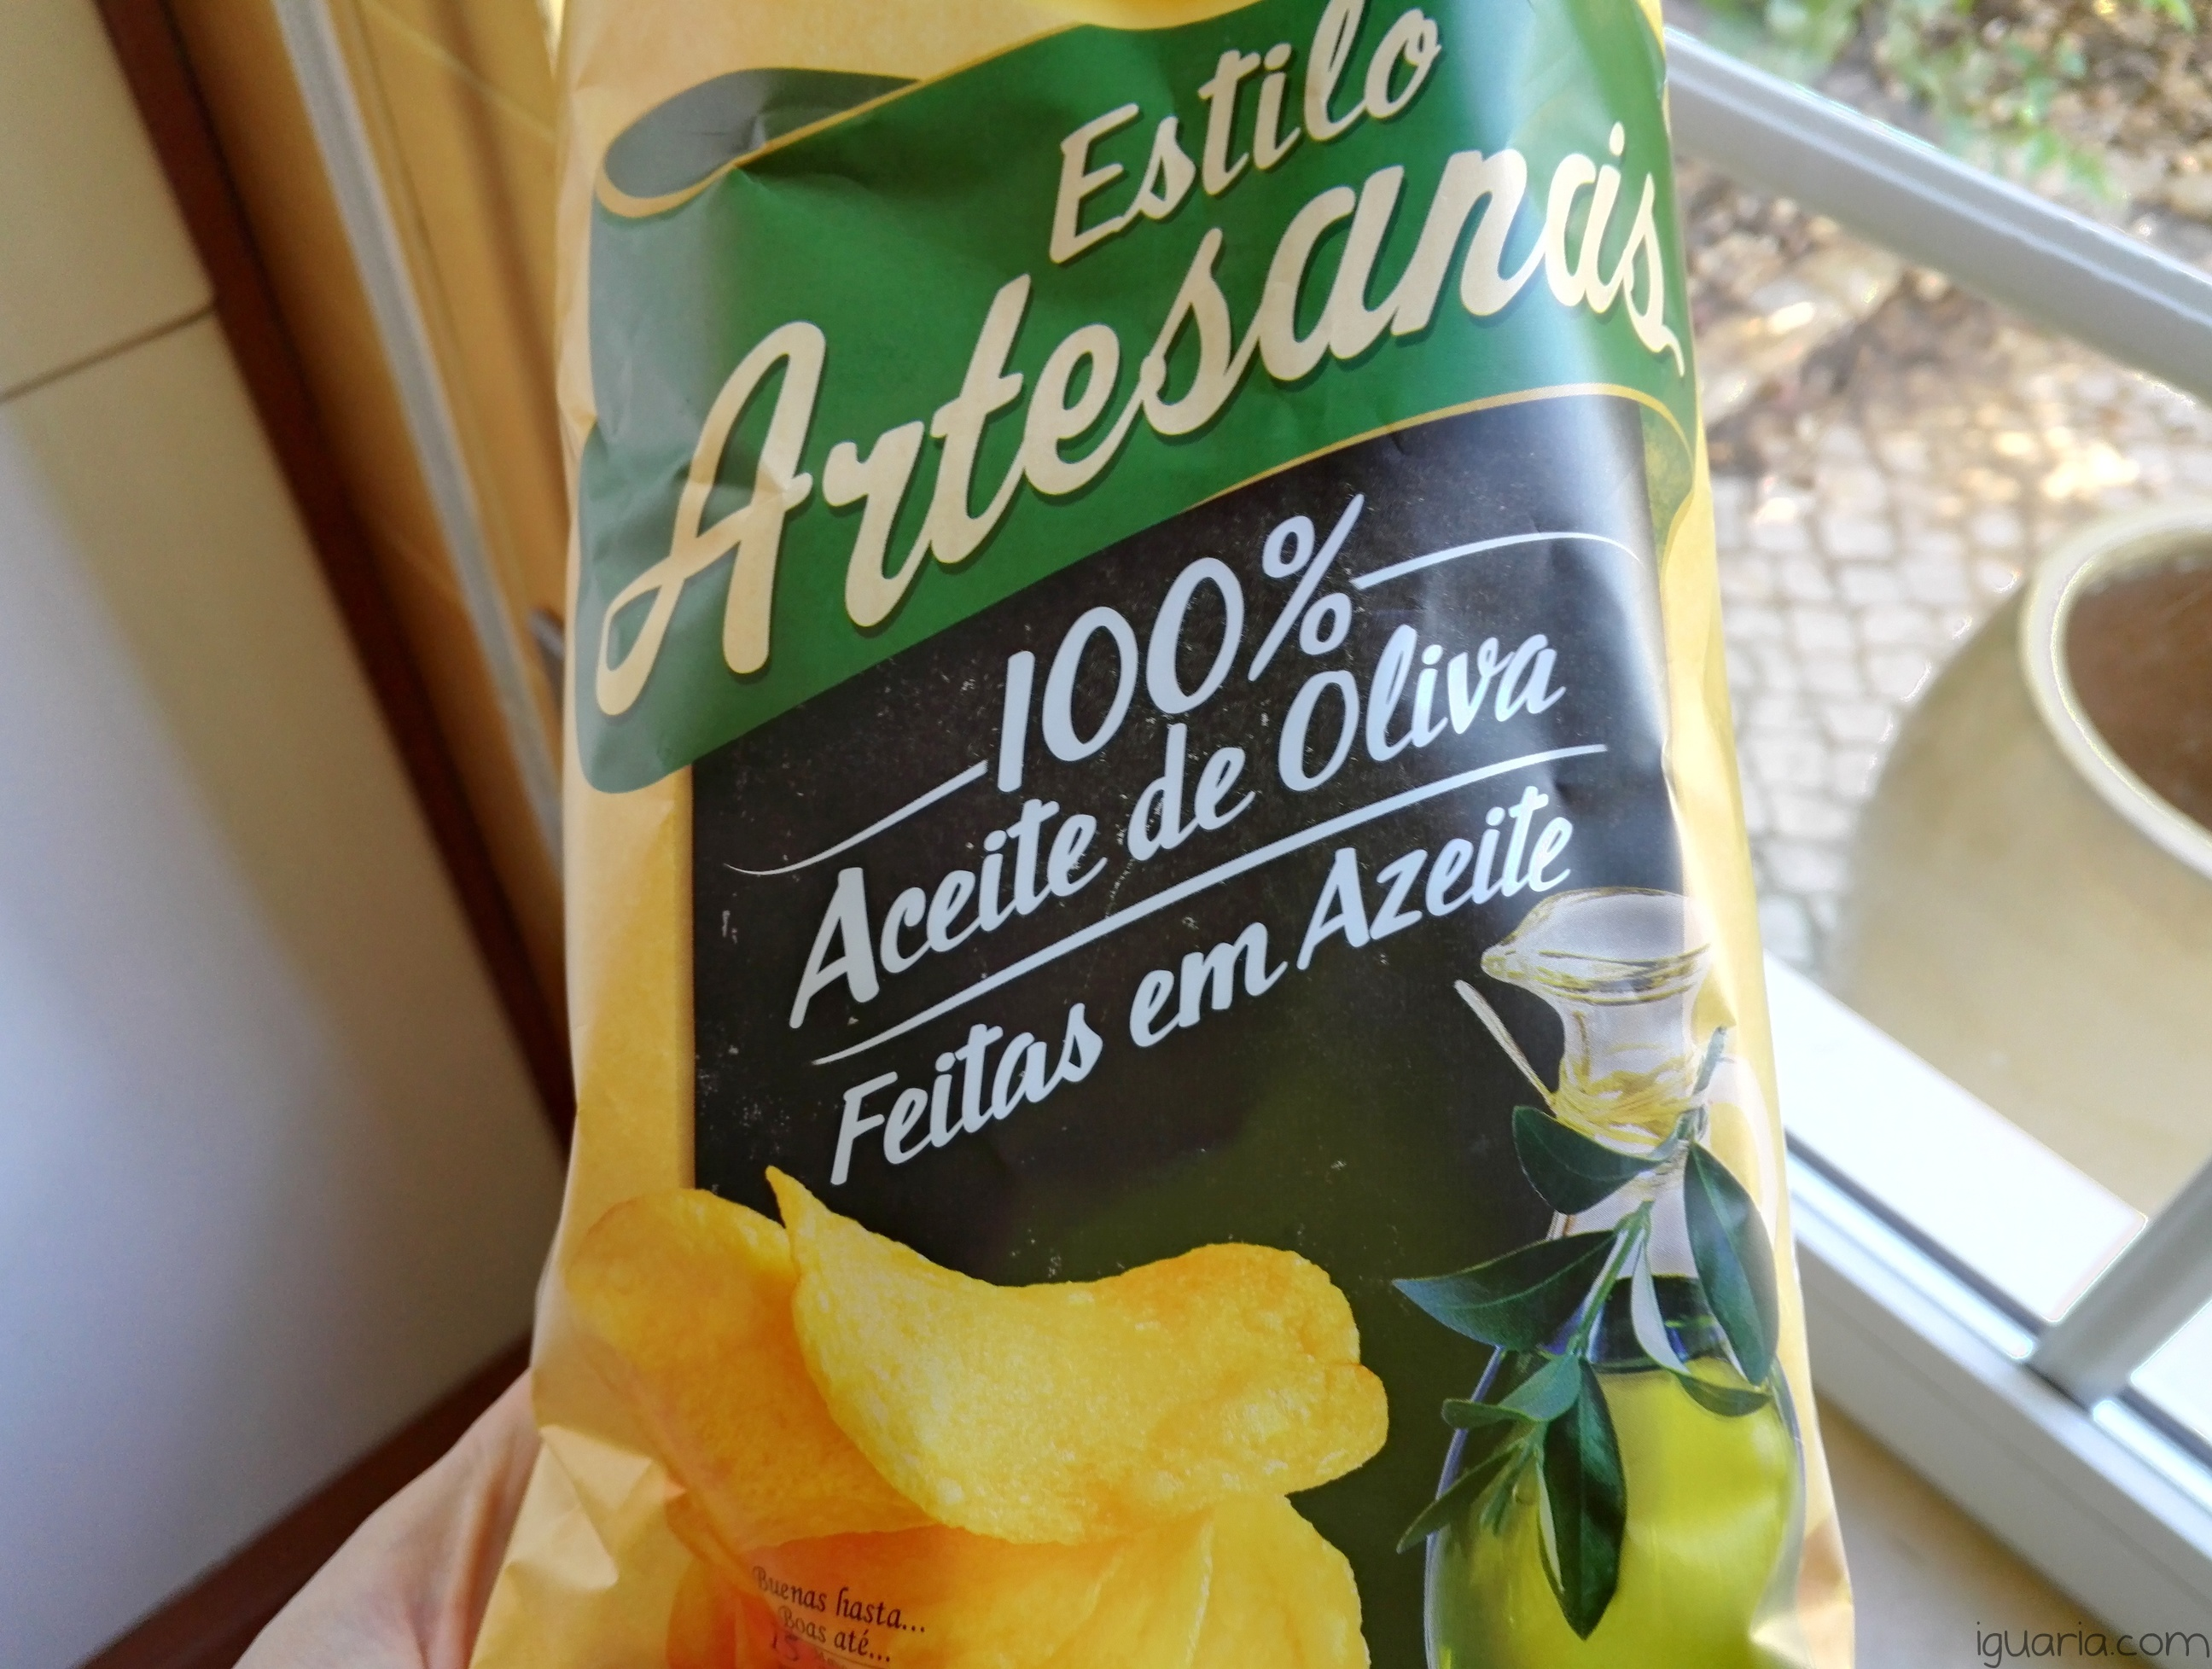 Iguaria_Batatas-Fritas-Artesanais